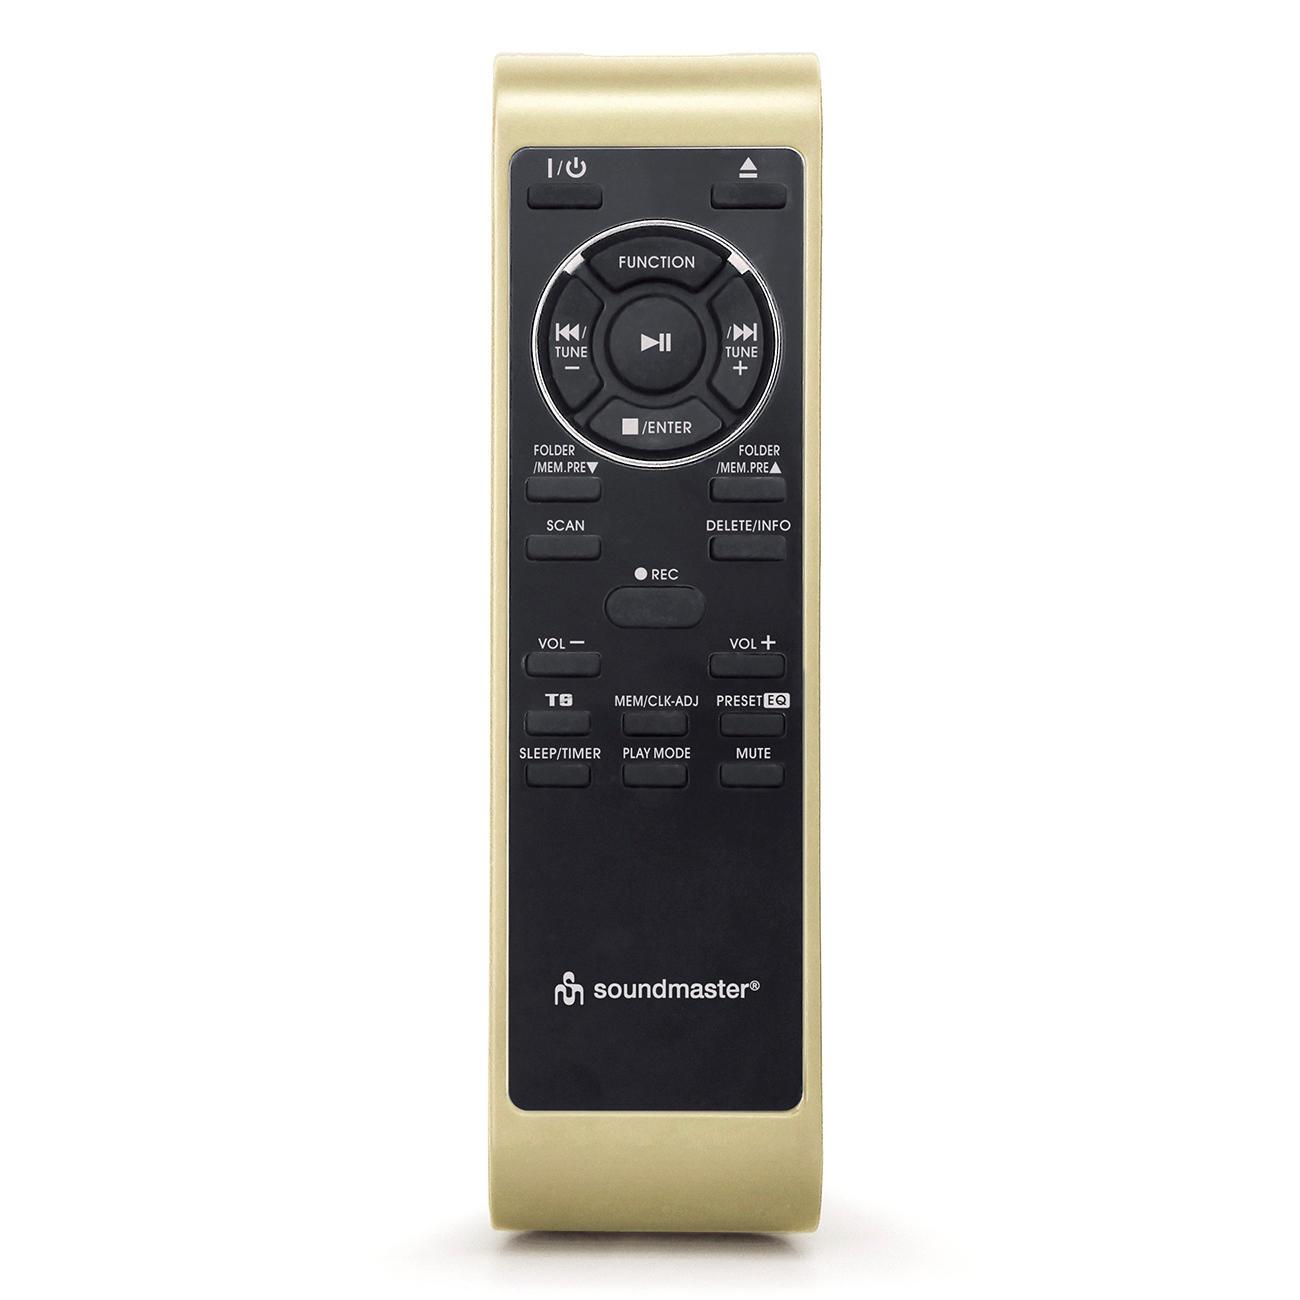 soundmaster nostalgie stereo musikcenter mit bluetooth. Black Bedroom Furniture Sets. Home Design Ideas